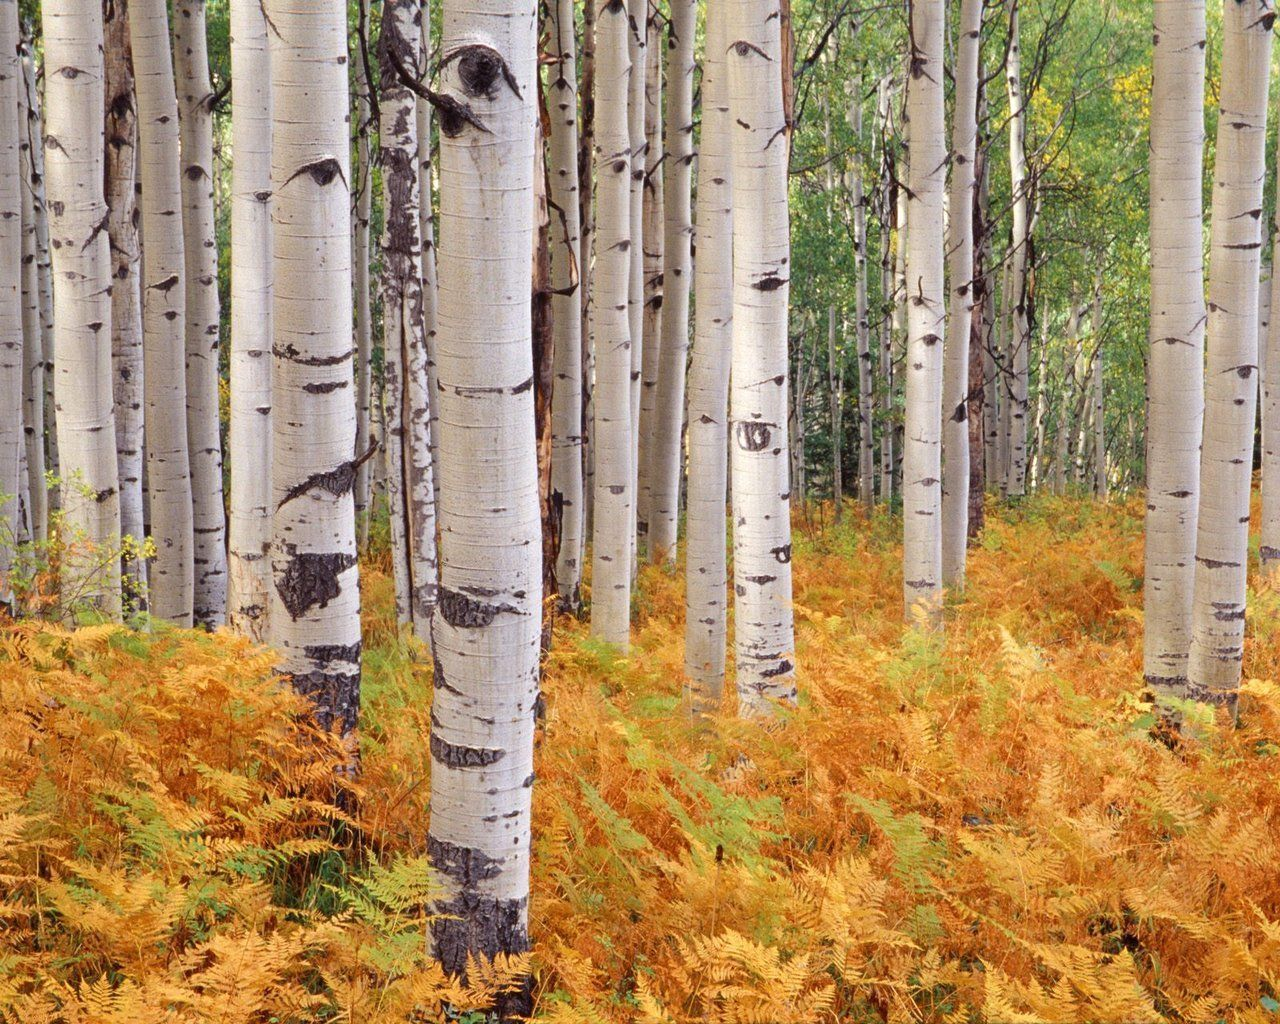 http://www.wallpaperswala.com/wp-content/gallery/birch-tree/birch-tree-wallpapers.jpg